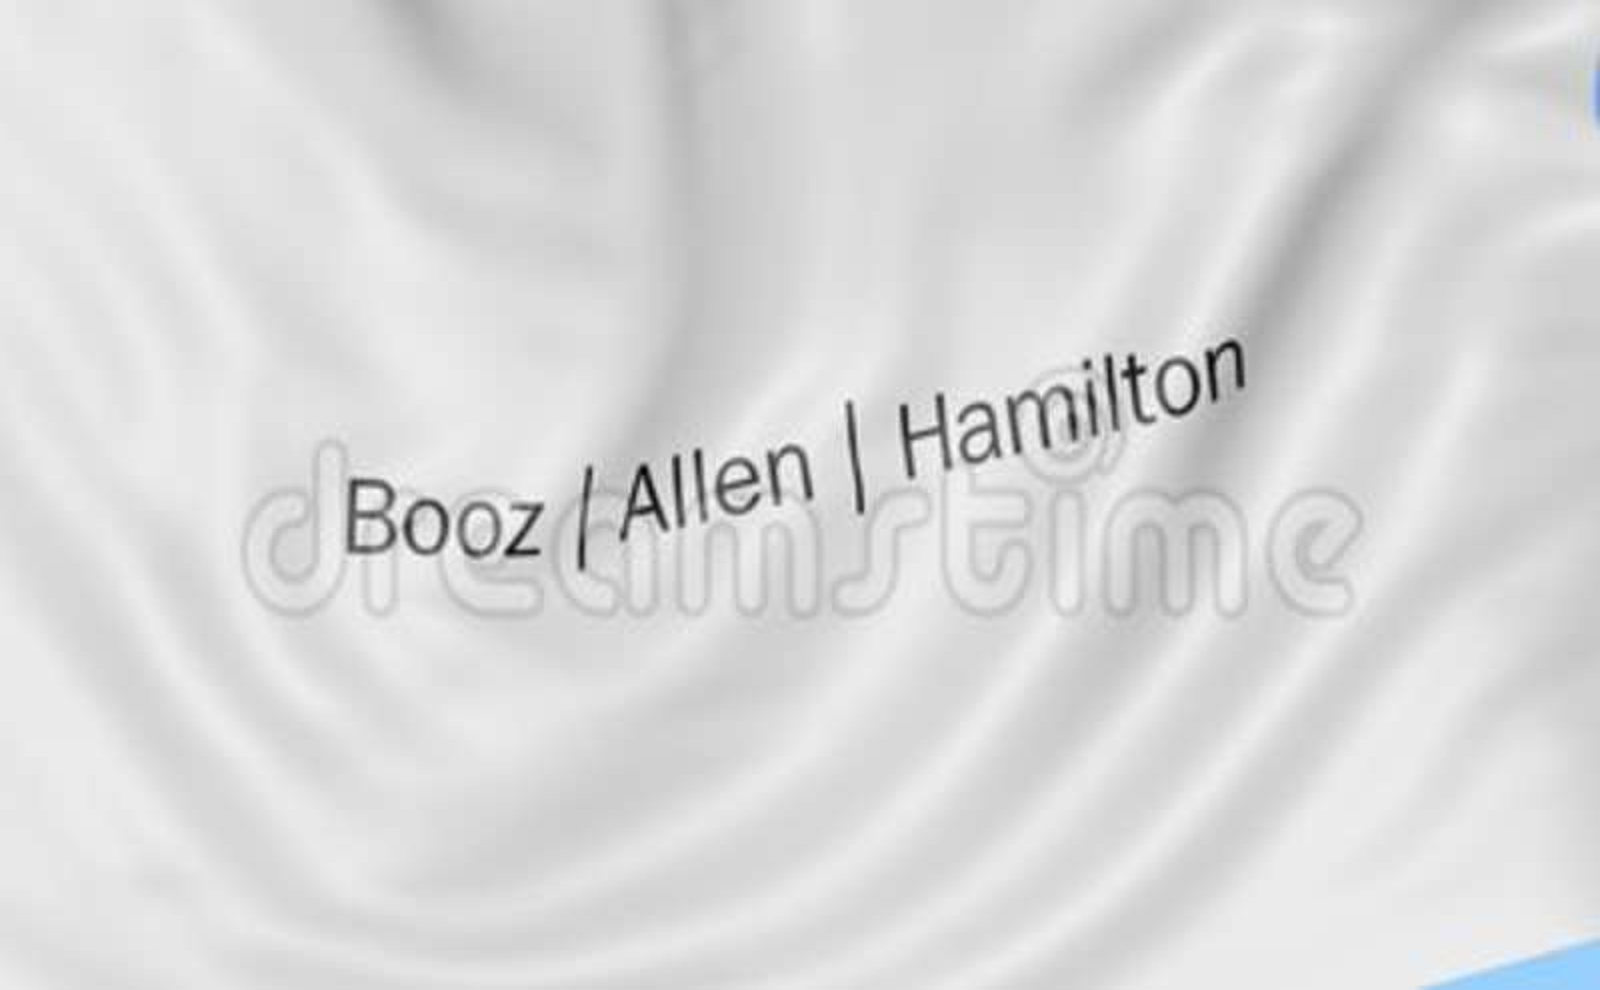 Waving Flag With Booz Allen Hamilton Logo Seamles Loop 4k Editorial